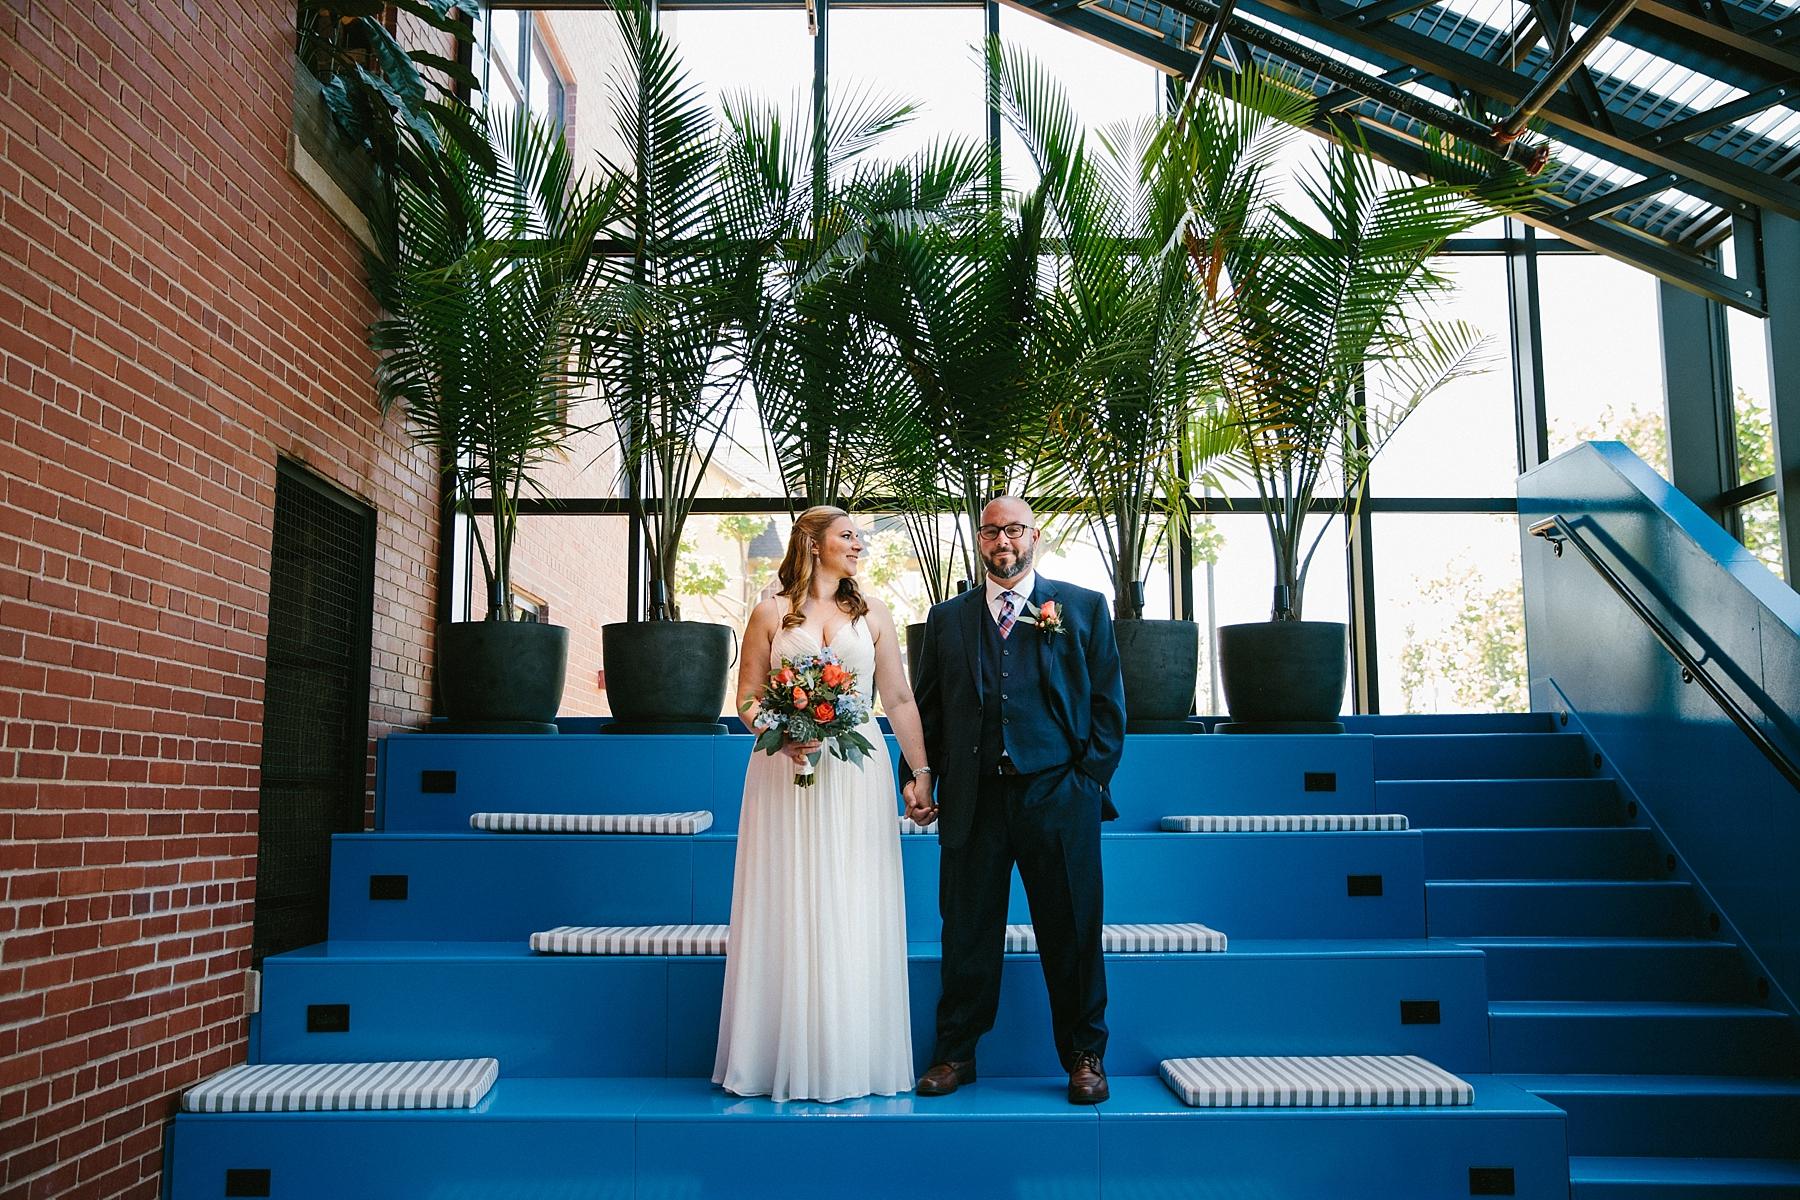 asbury-park-nj-wedding-salt-creek-grill_0008.jpg